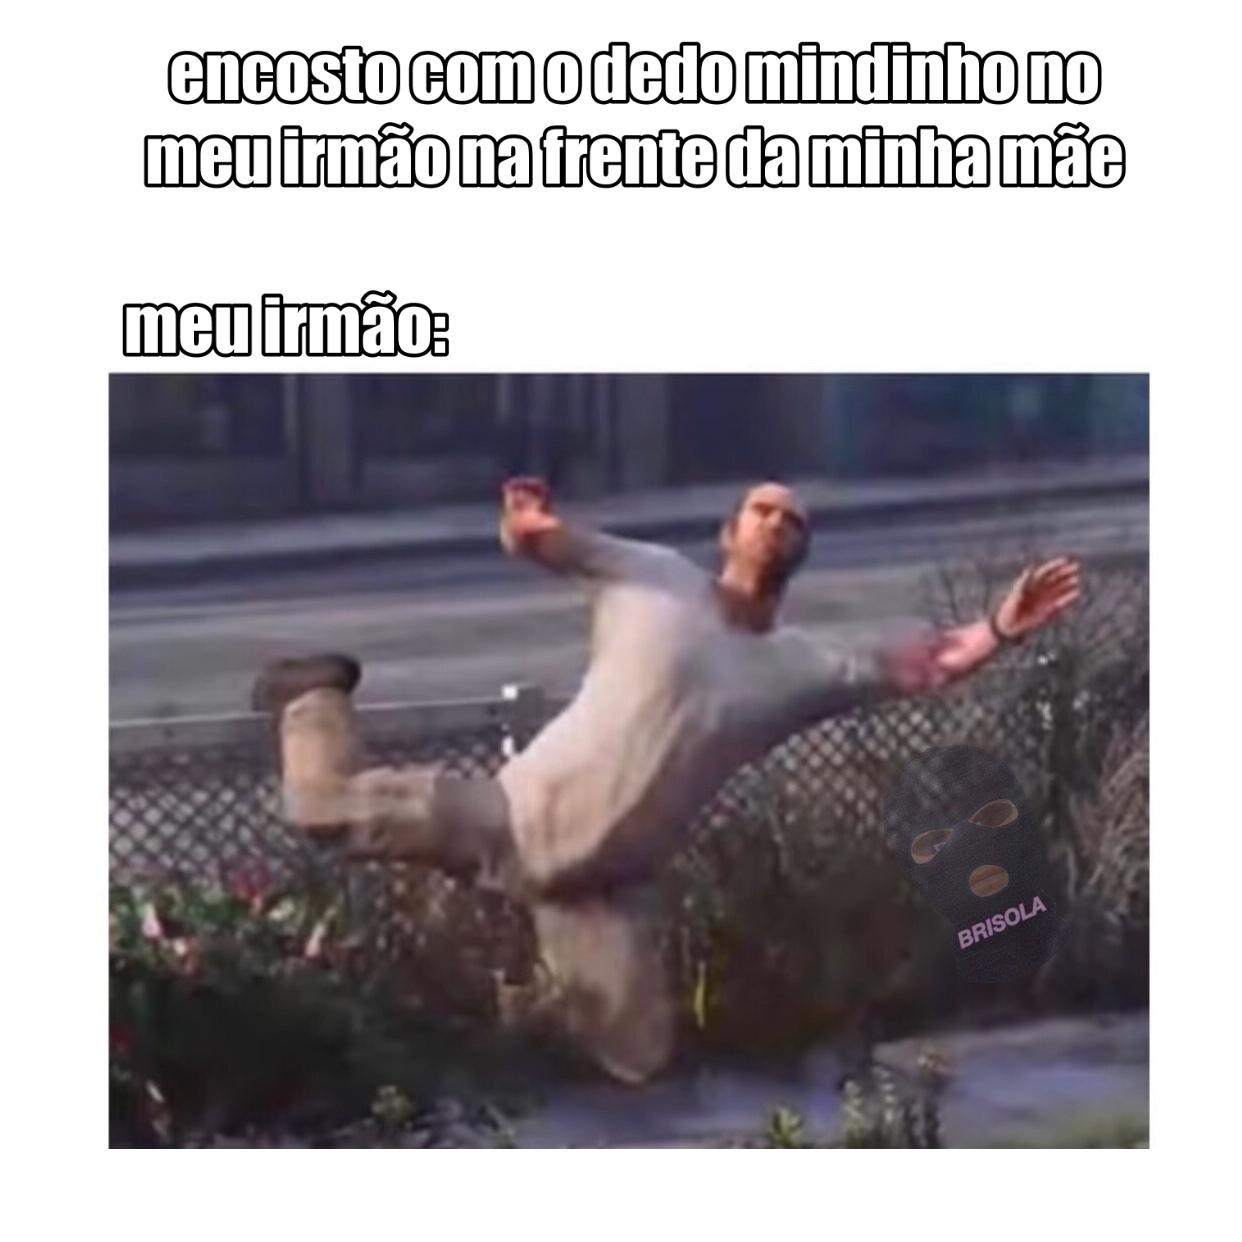 manheeeeee - meme